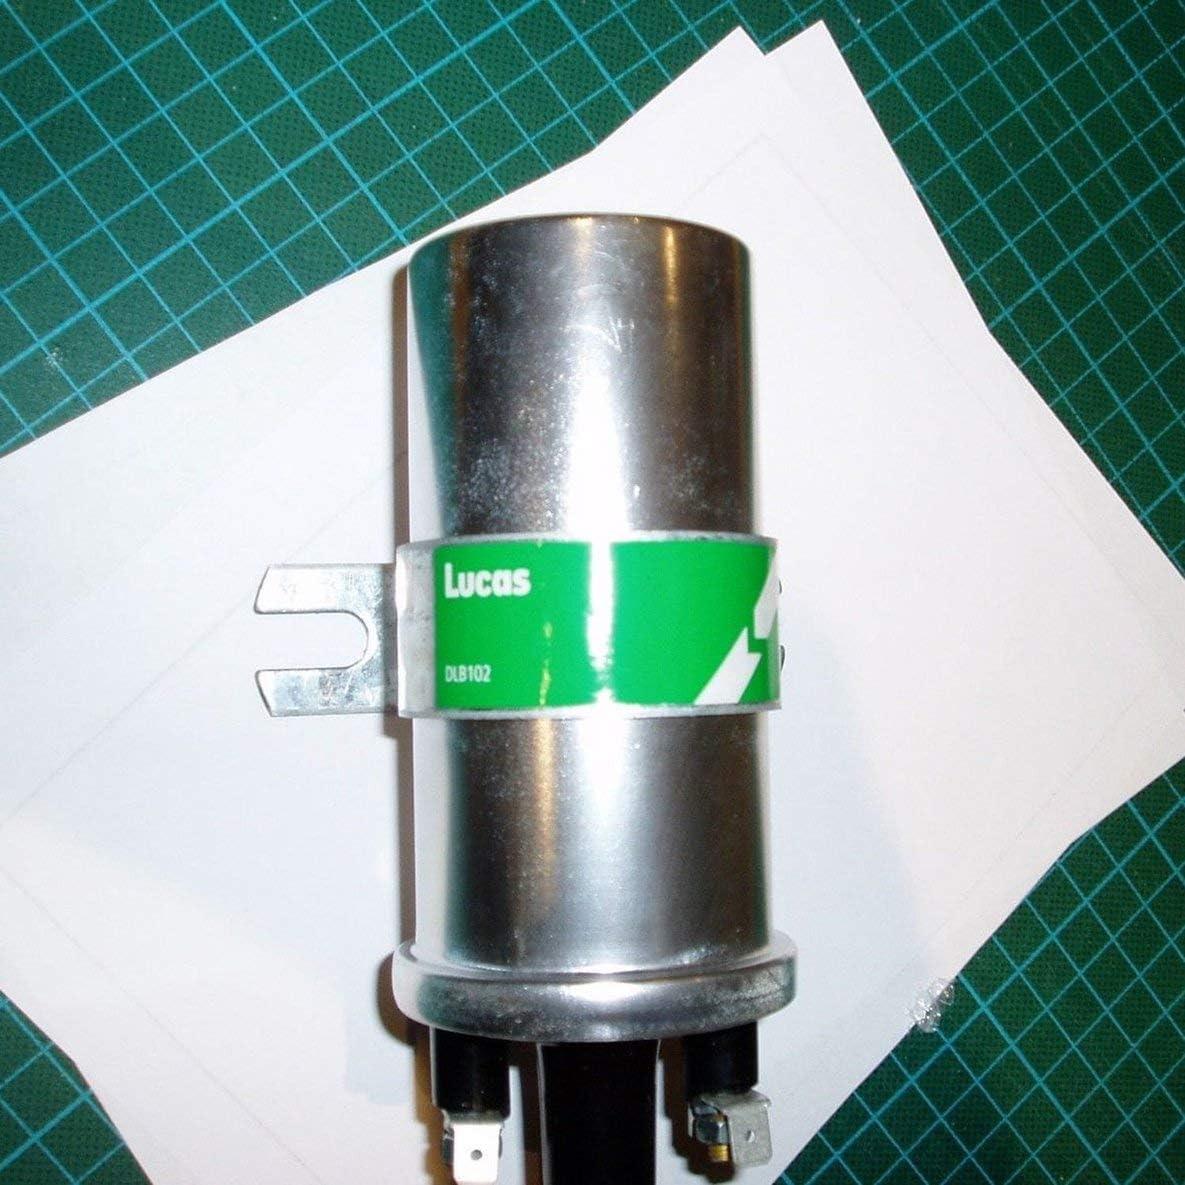 Lucas DLB101 12 Volt 3 Ohm Z/ündspule ohne Vorschaltger/ät Silber